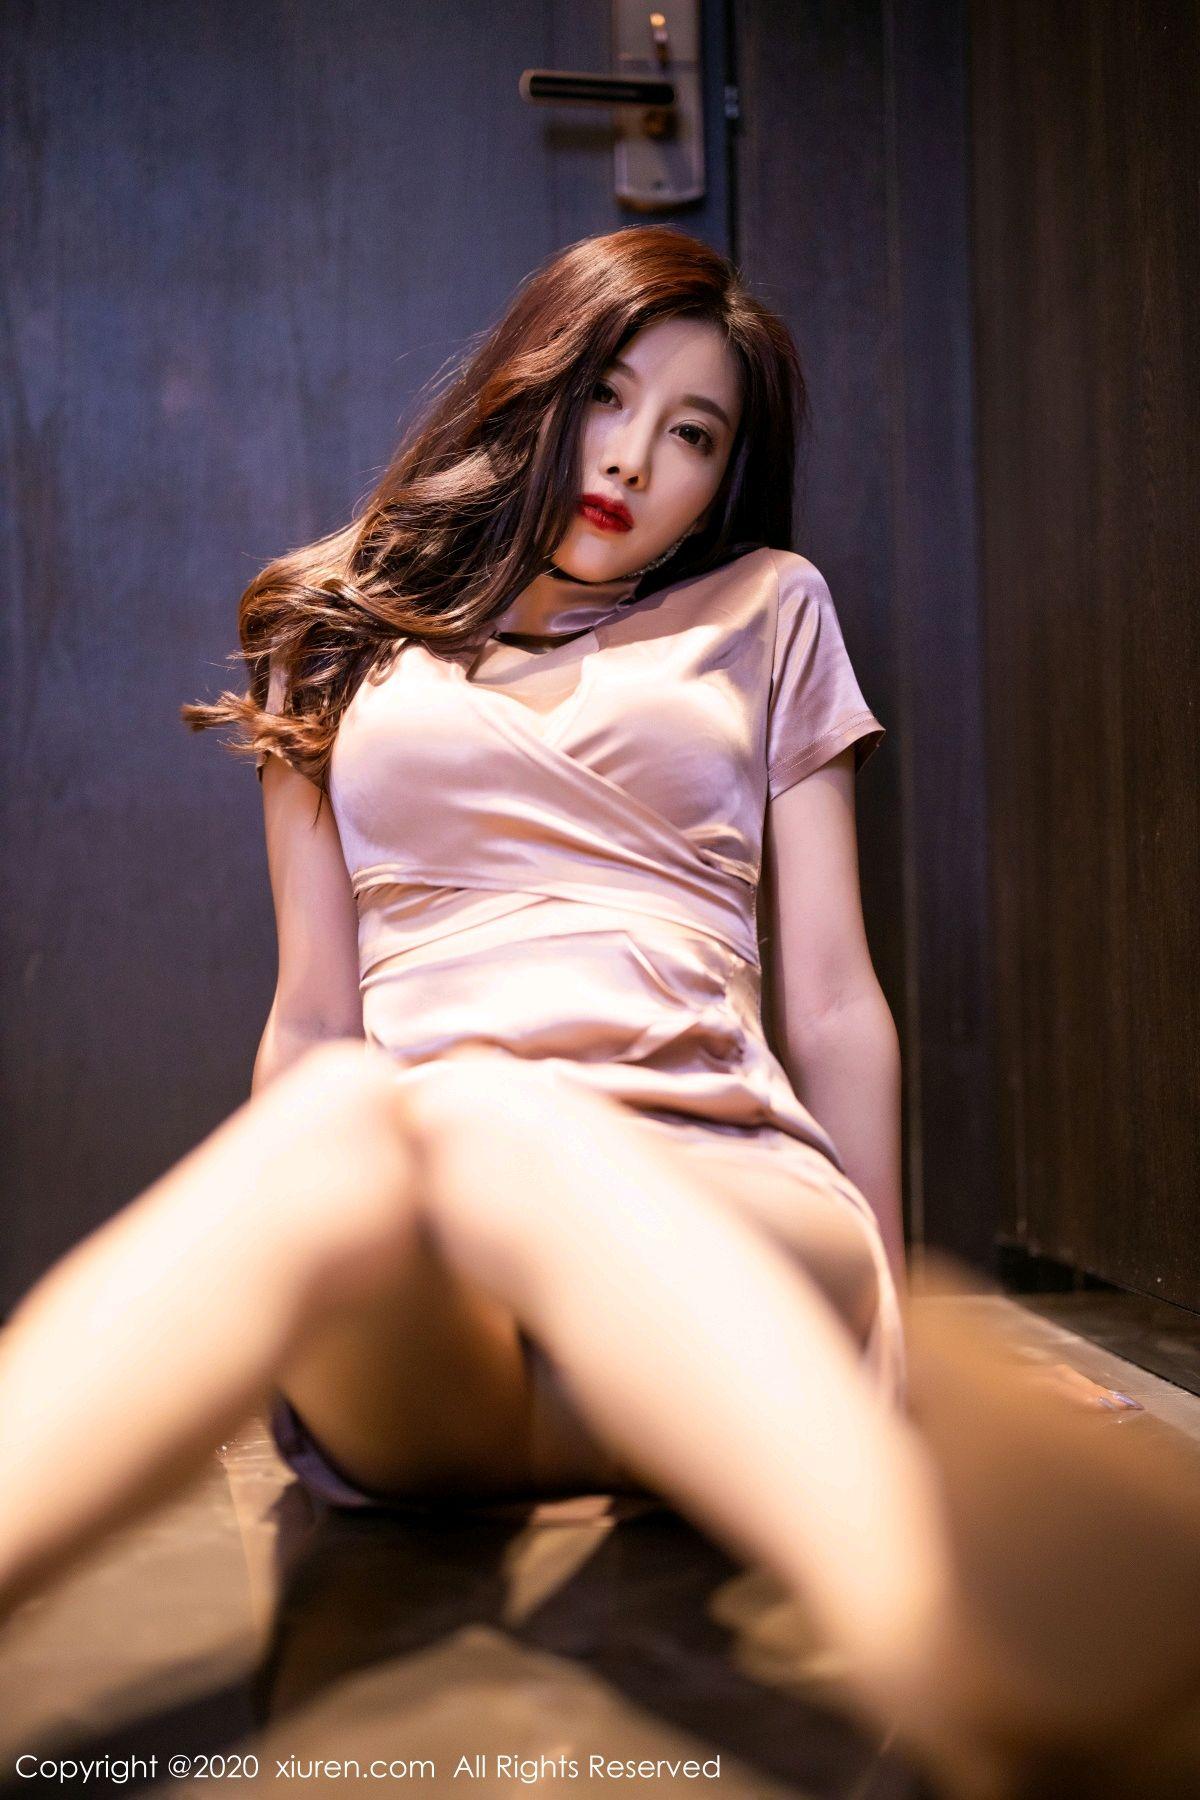 [XiuRen] Vol.2587 Yang Chen Chen 49P, Underwear, Xiuren, Yang Chen Chen